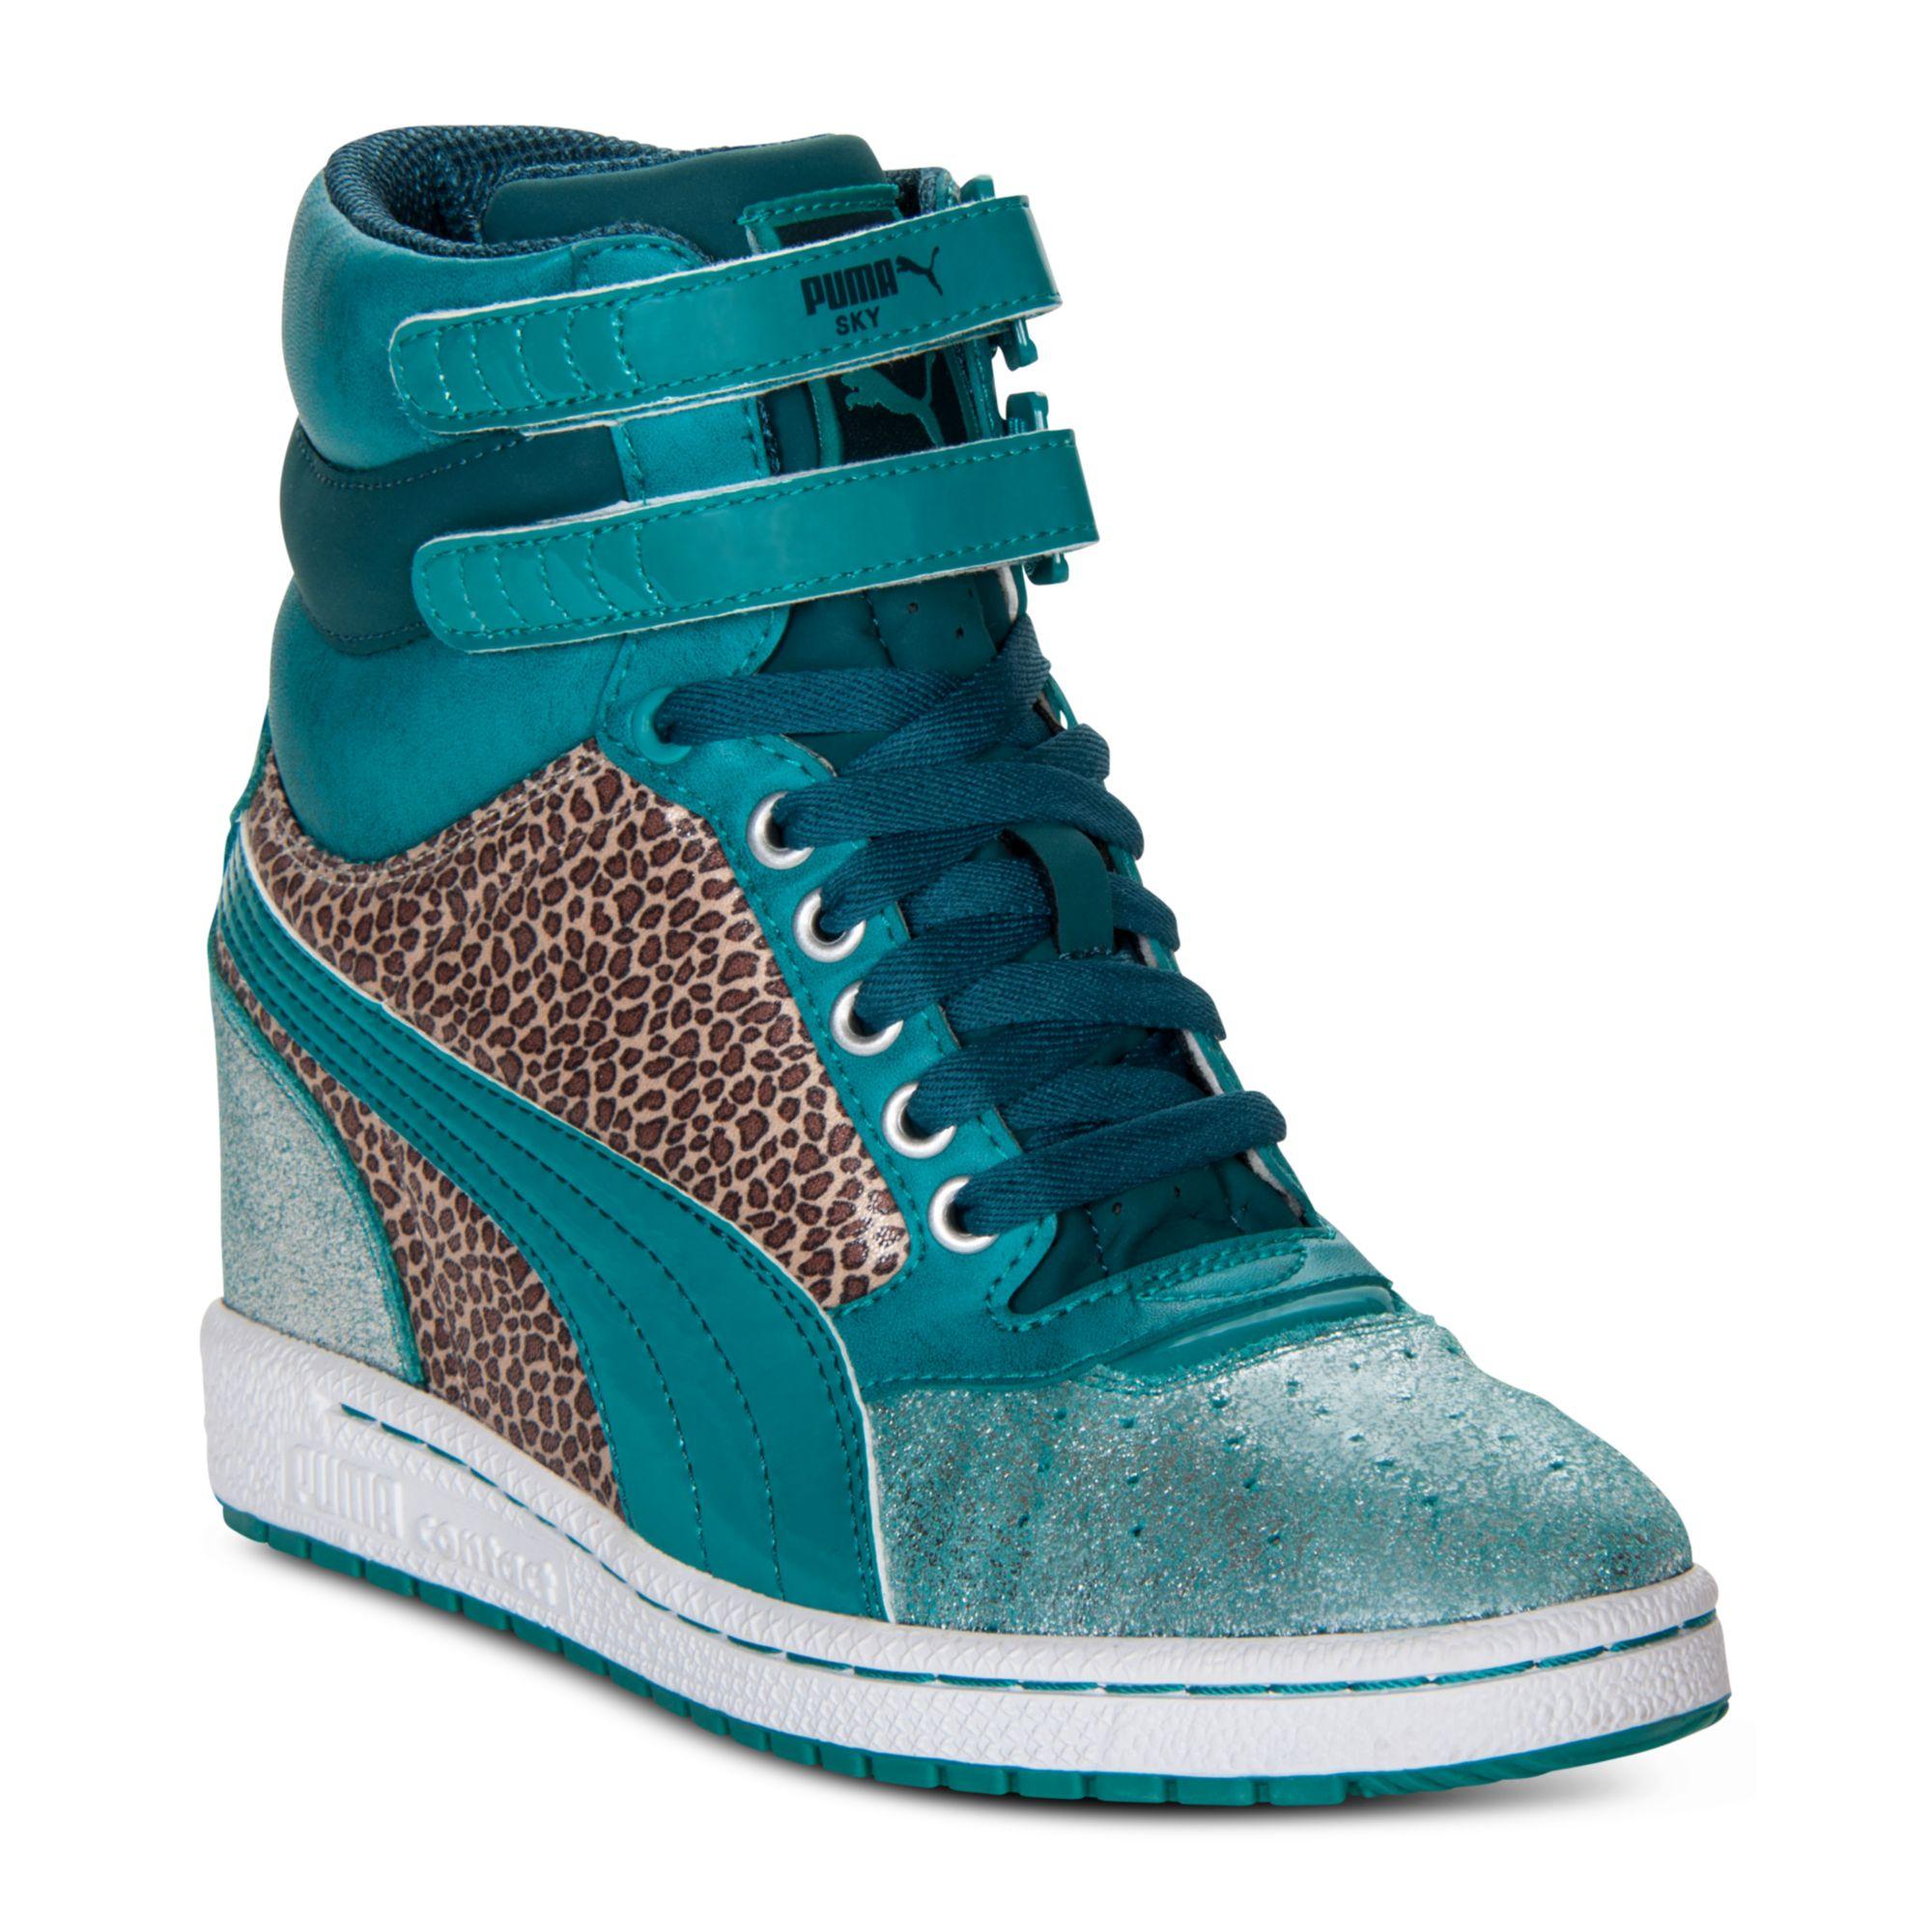 8e1e878a7db Lyst - PUMA Sky Wedge Shine Casual Sneakers in Green